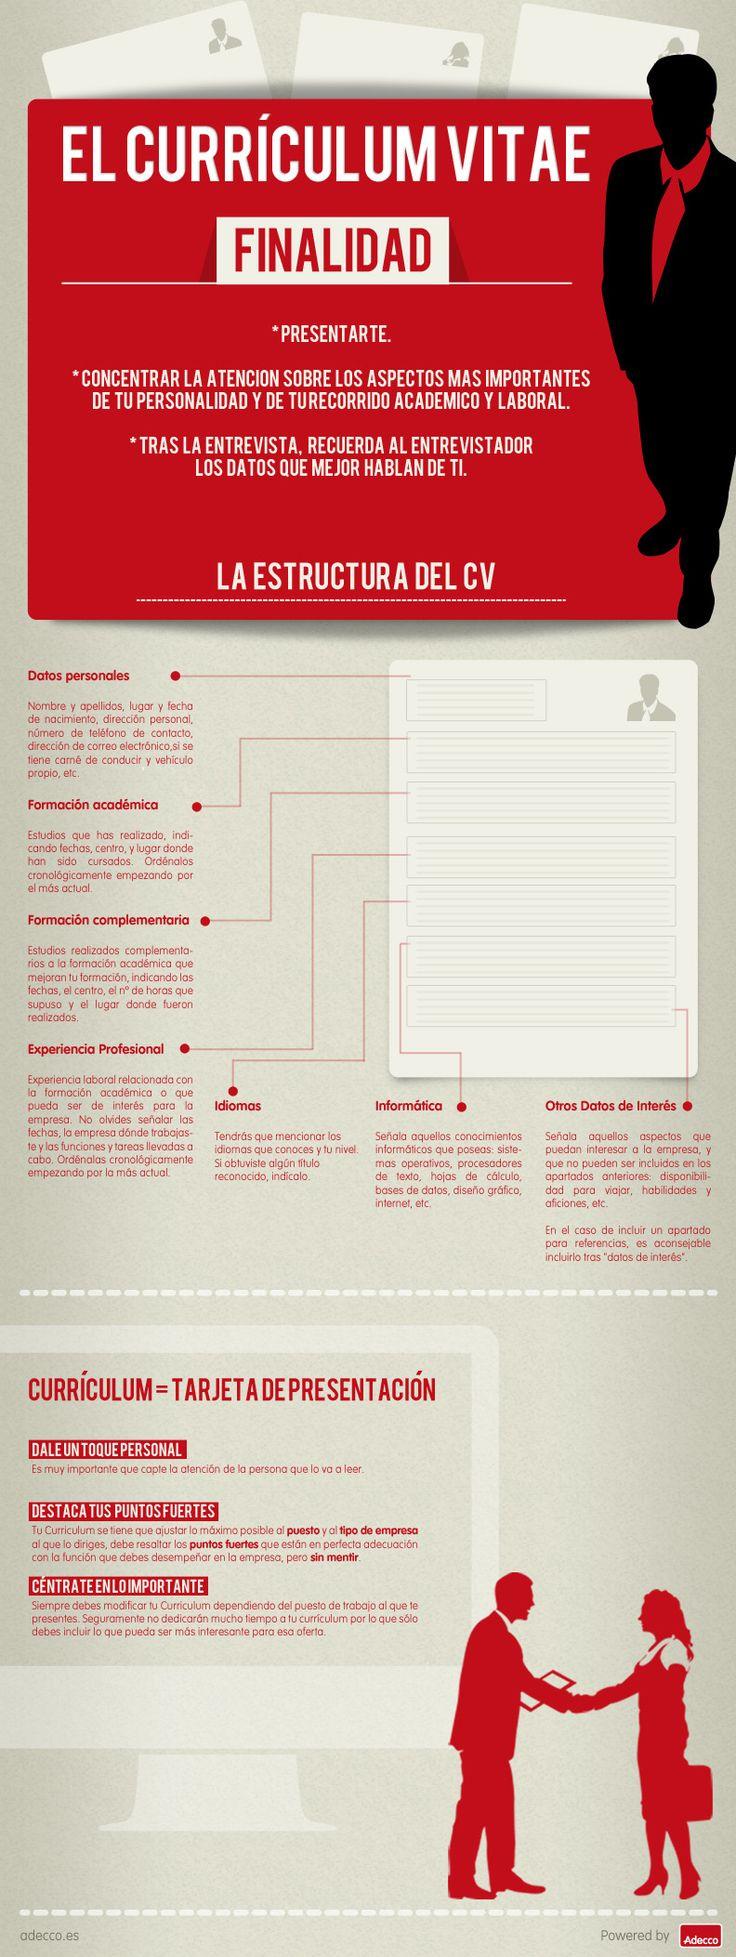 187 best Diseño Currículum images on Pinterest | Spanish, Life ...